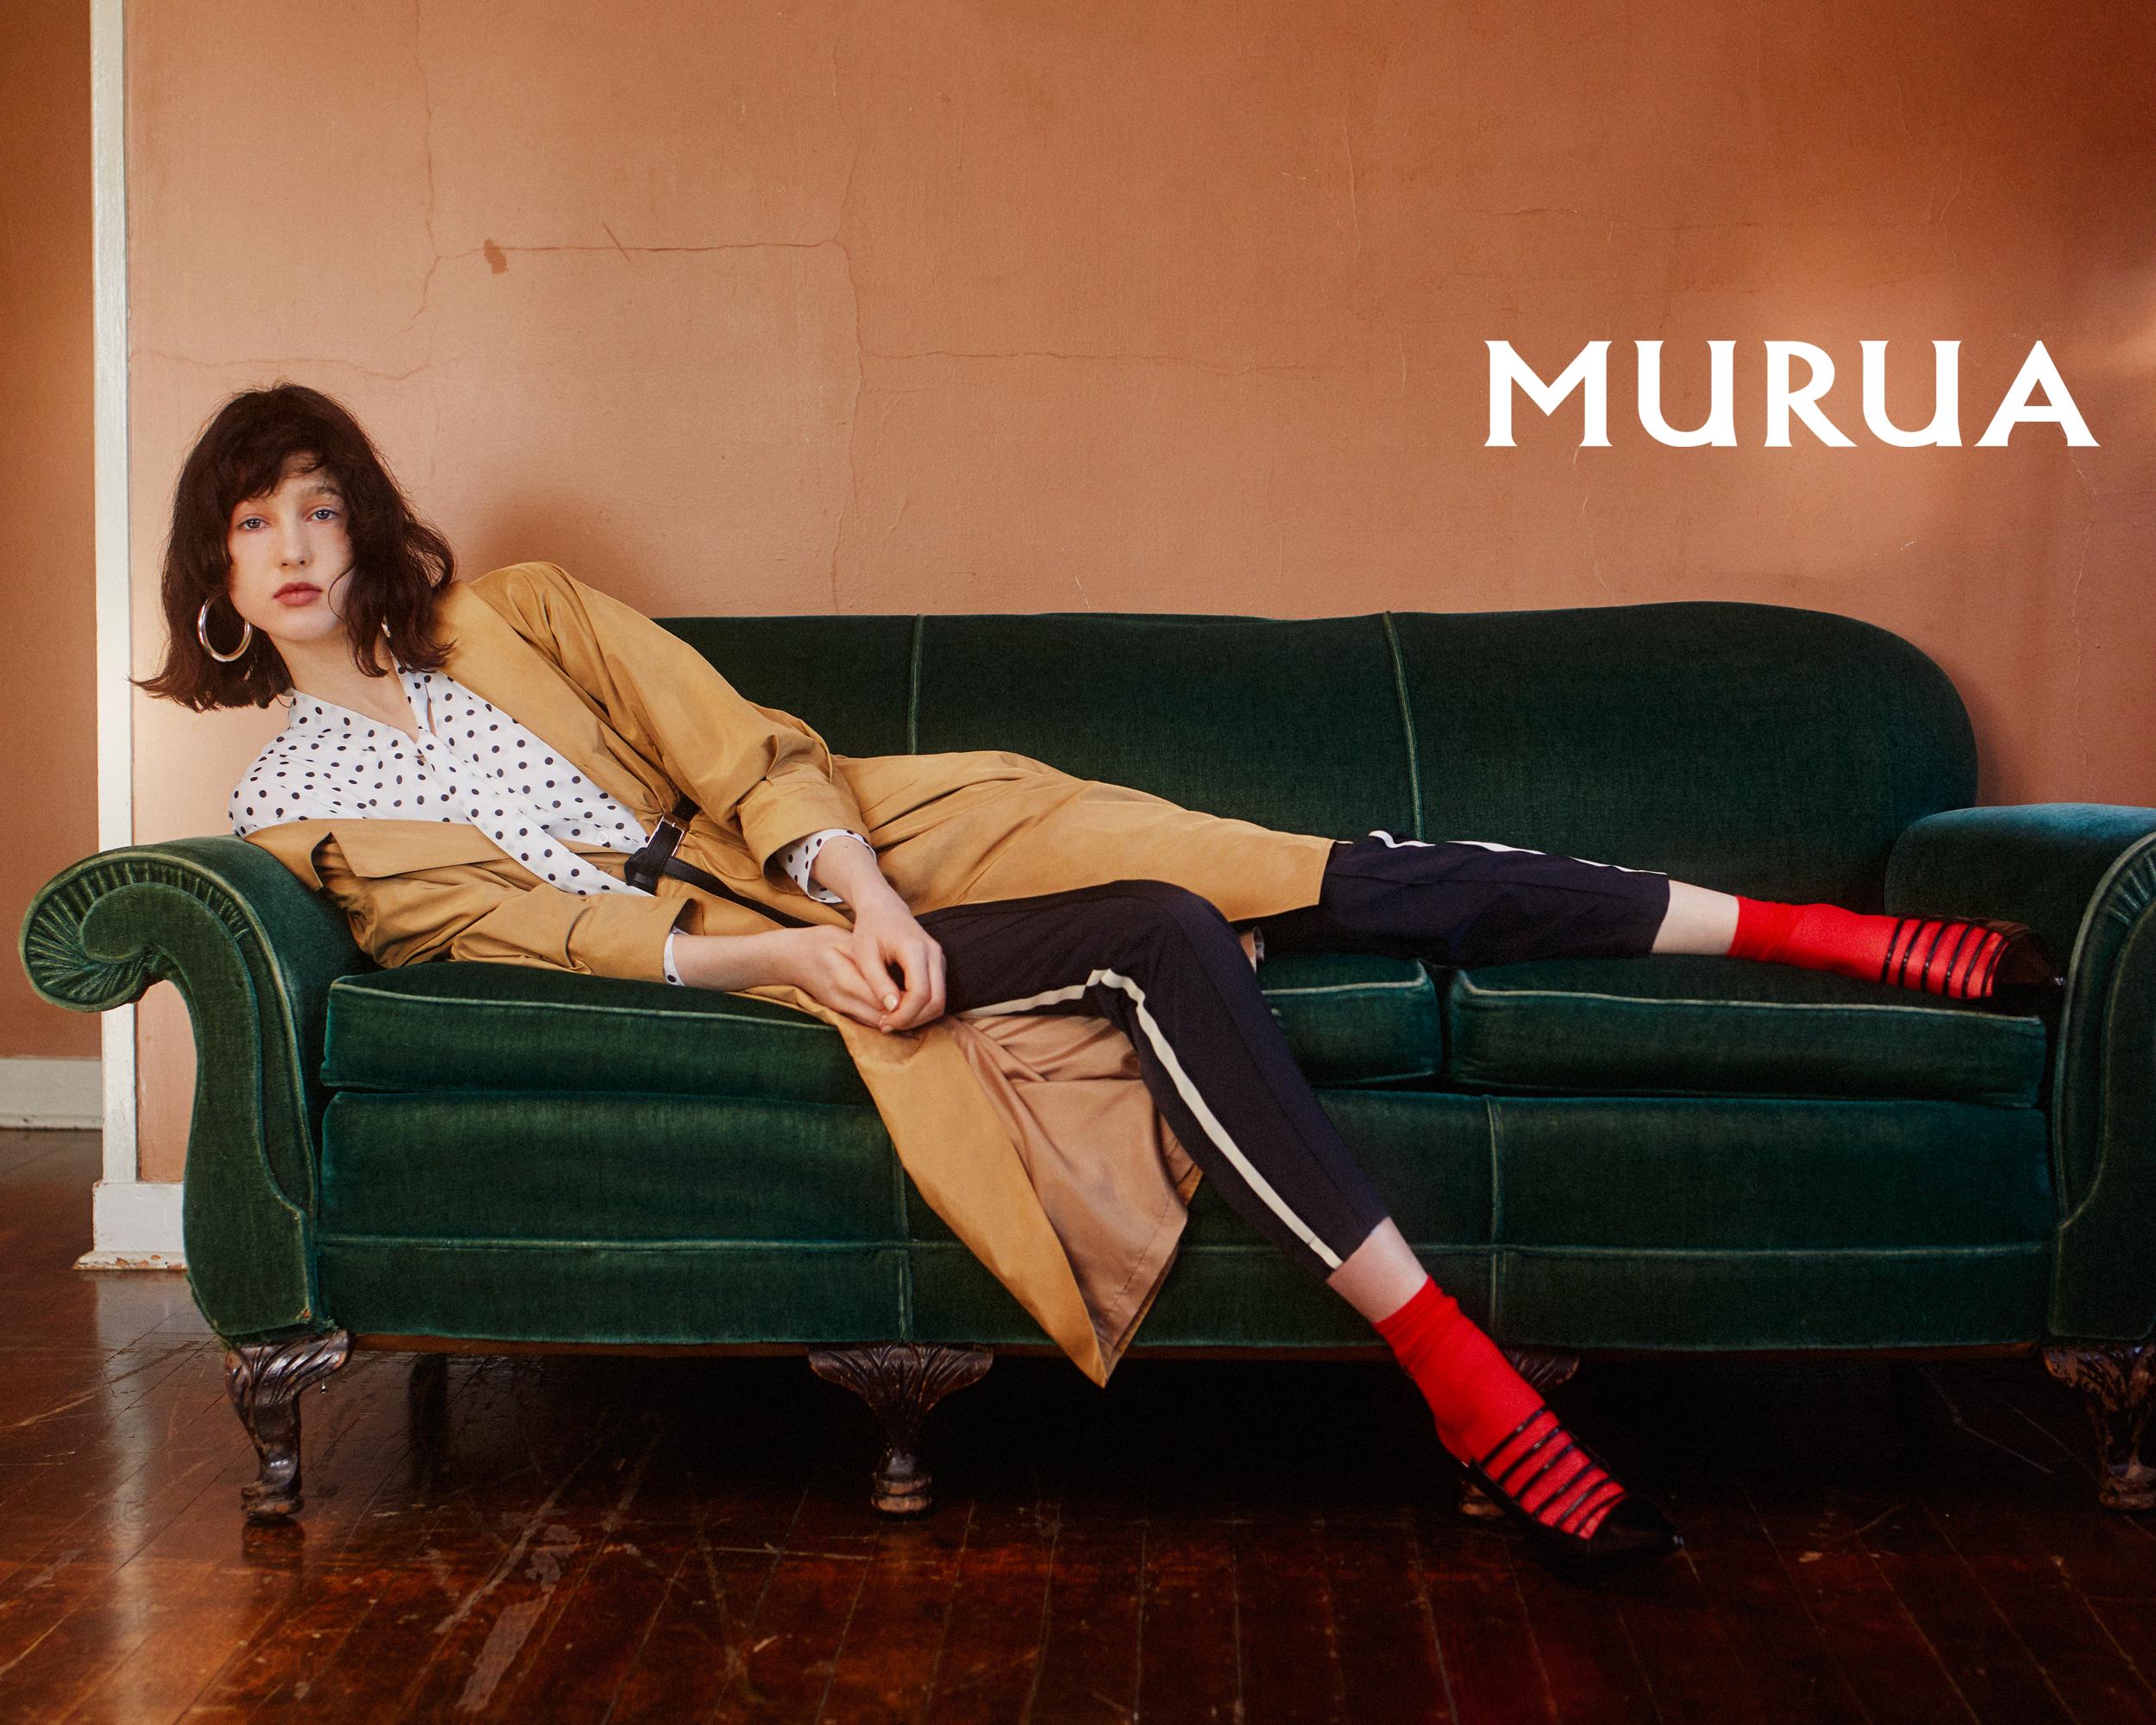 MURUA 熊本上通り店